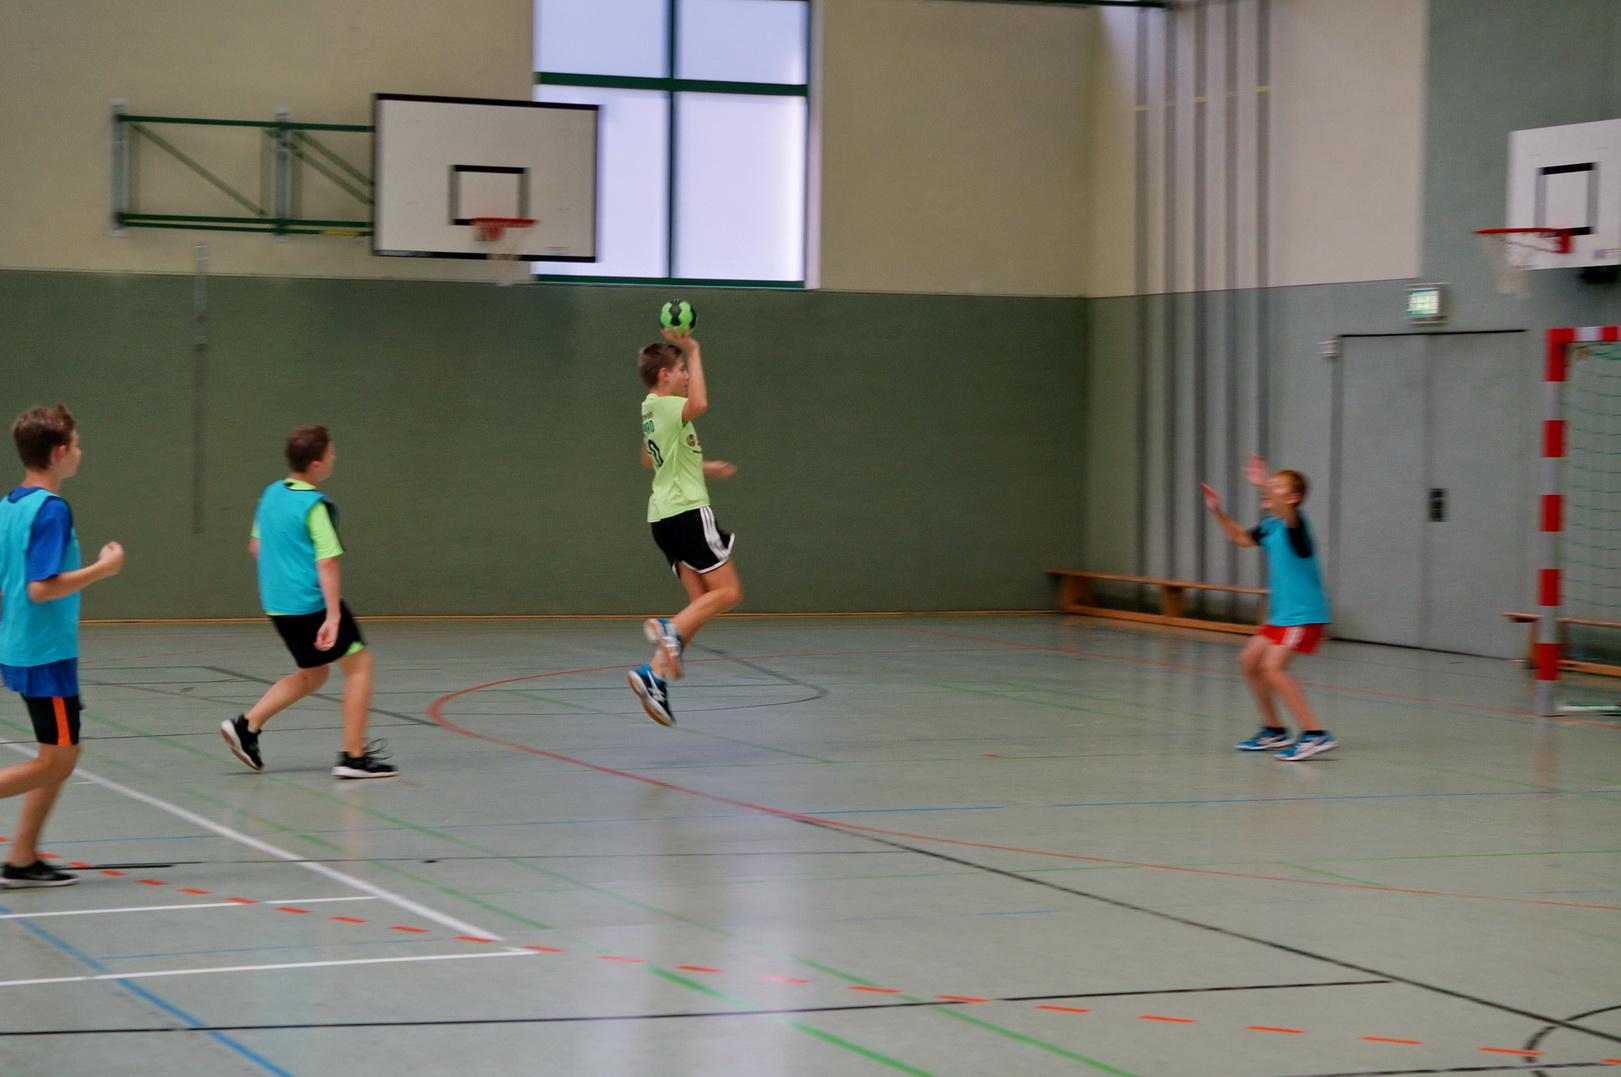 201808_Handballcamp_SDH_MG_106w